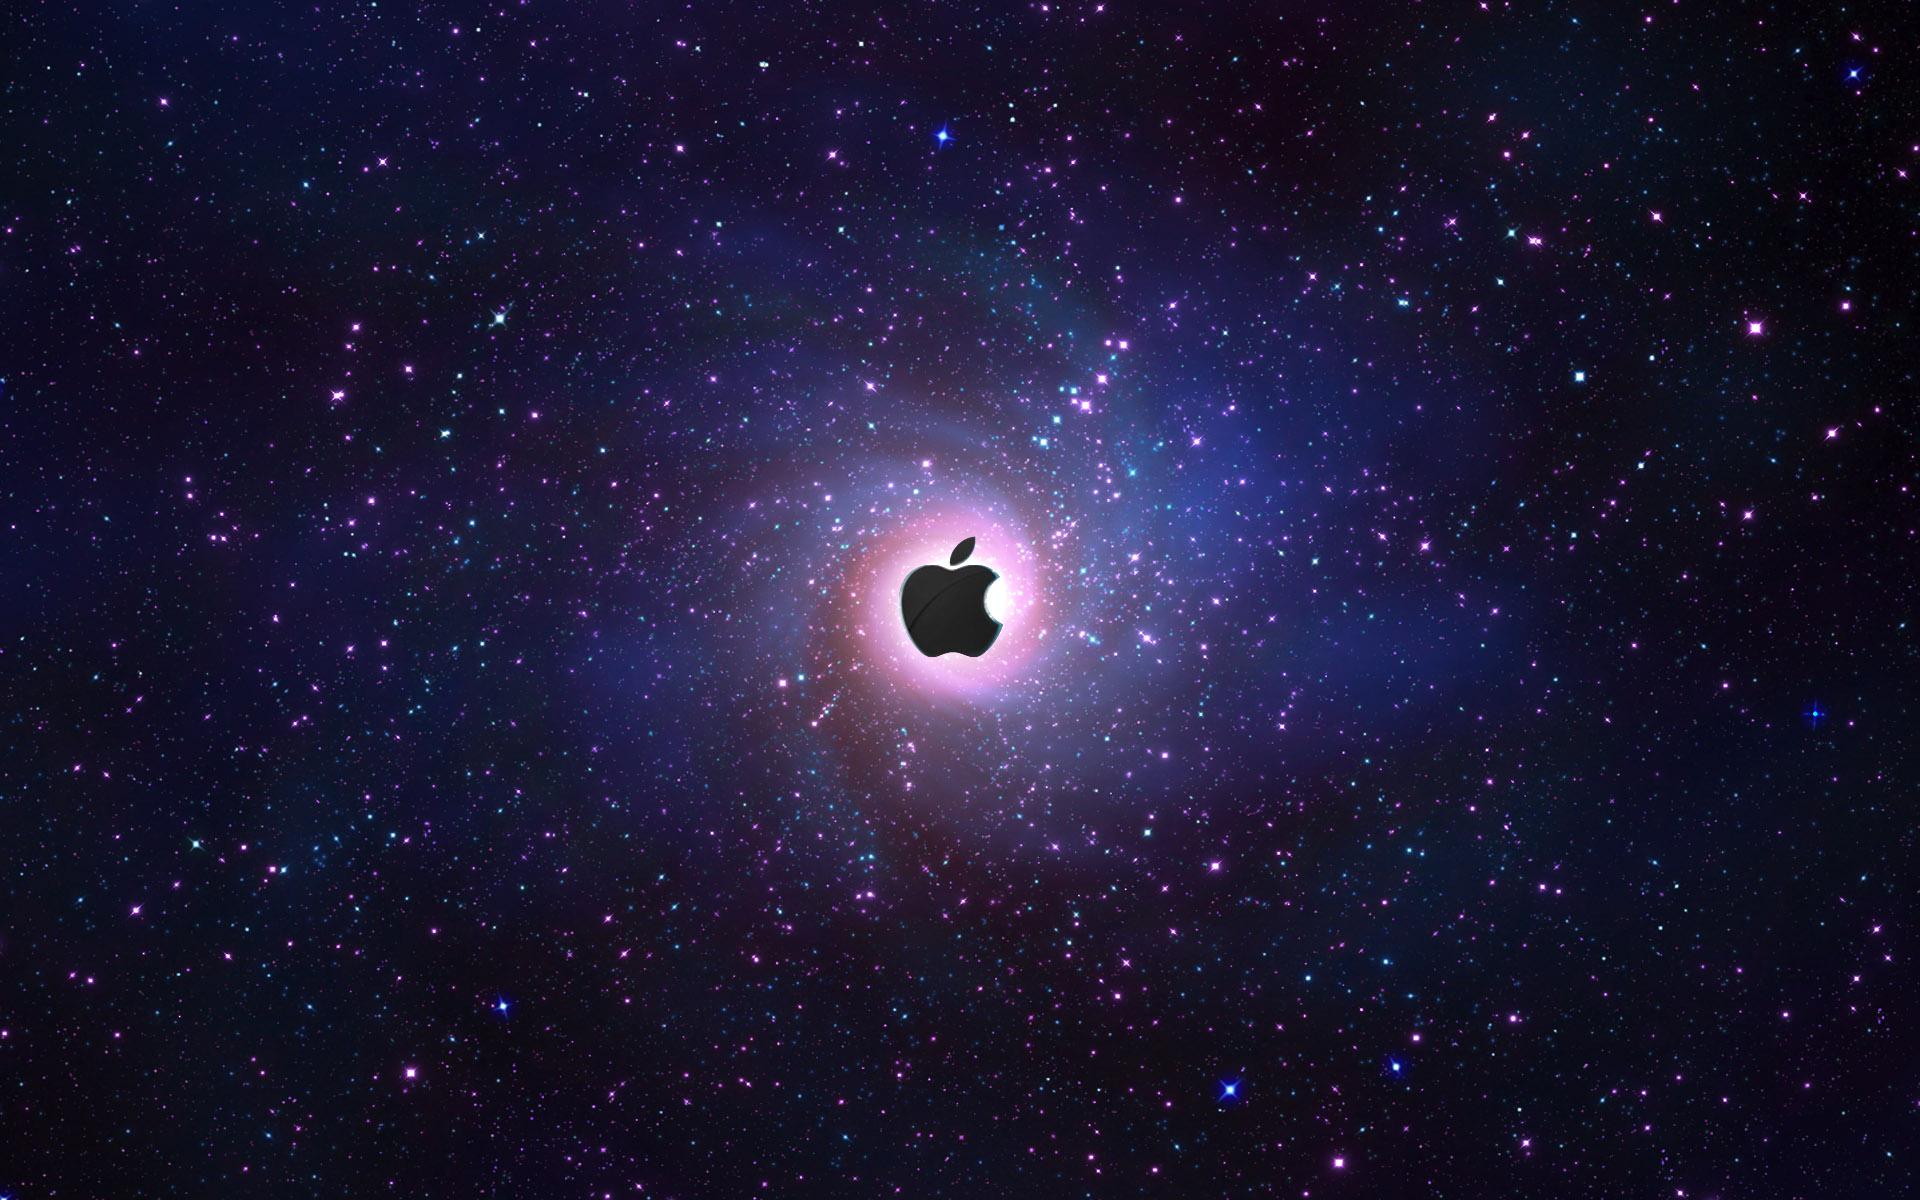 Best Wallpaper Macbook Official - apple_wallpaper_by_primerajosy14-d5pygs1  Photograph_295164.jpg